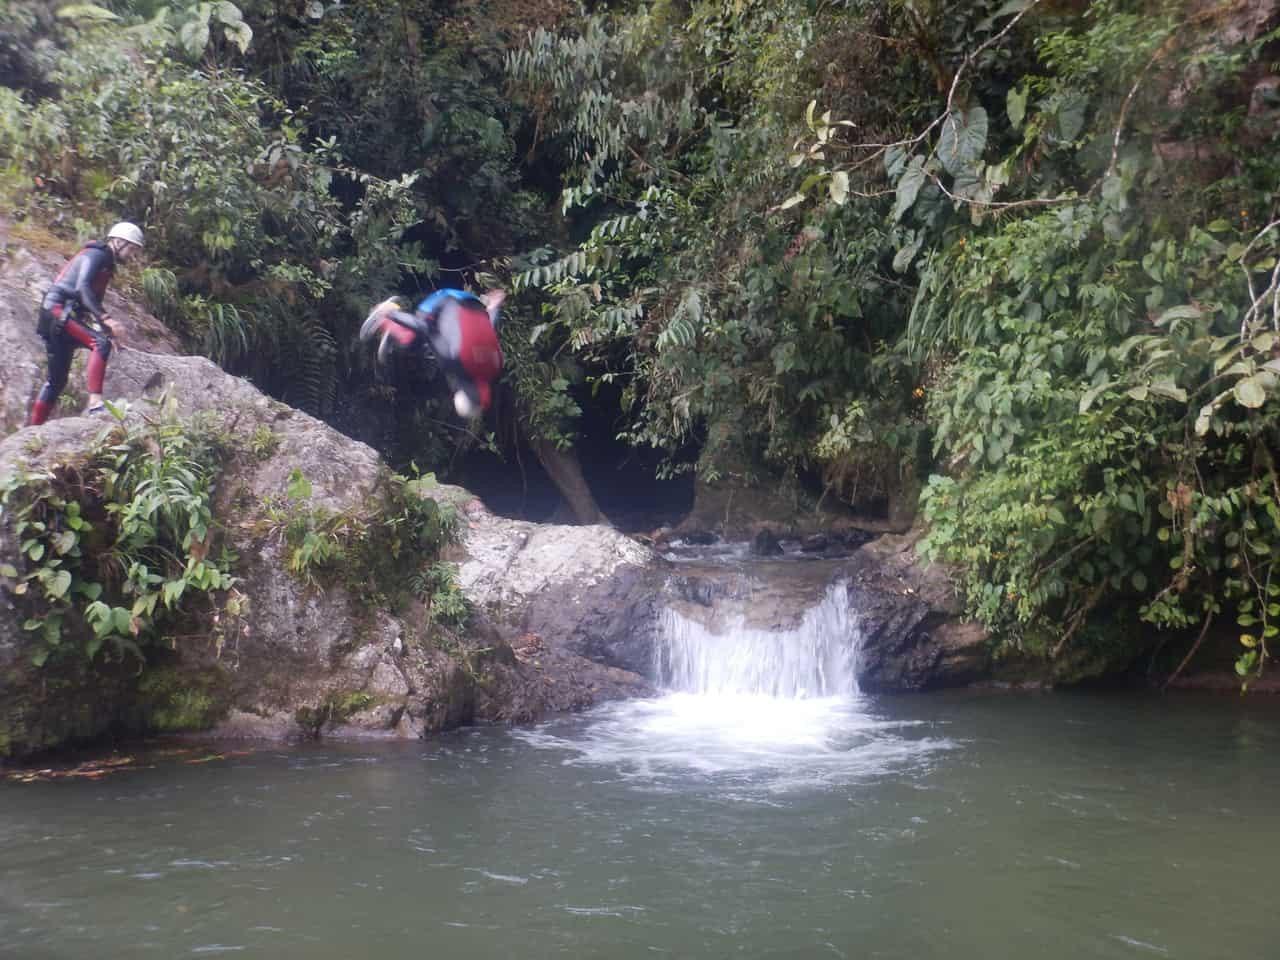 Backflipping into the cool refreshing pool - Takiri Travel, Ecuador